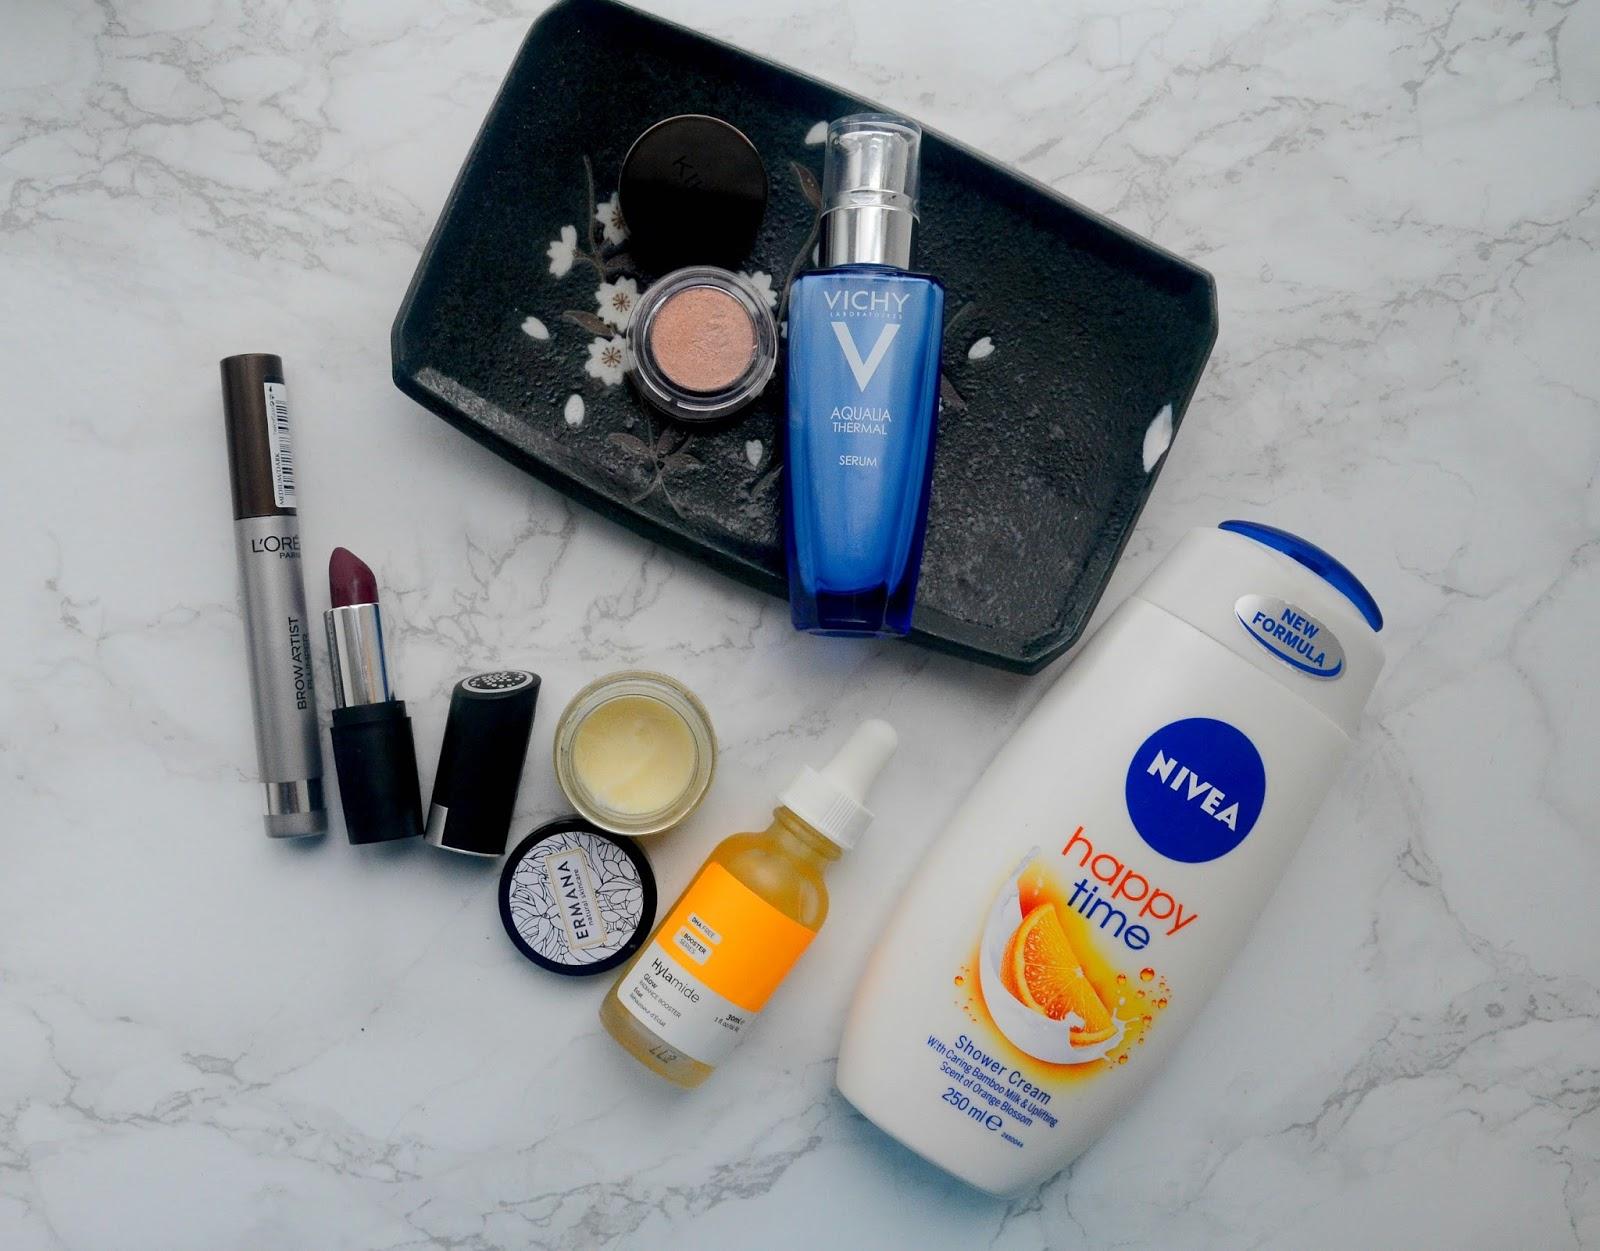 loreal collection makeup lipstick zoella berry lisptick